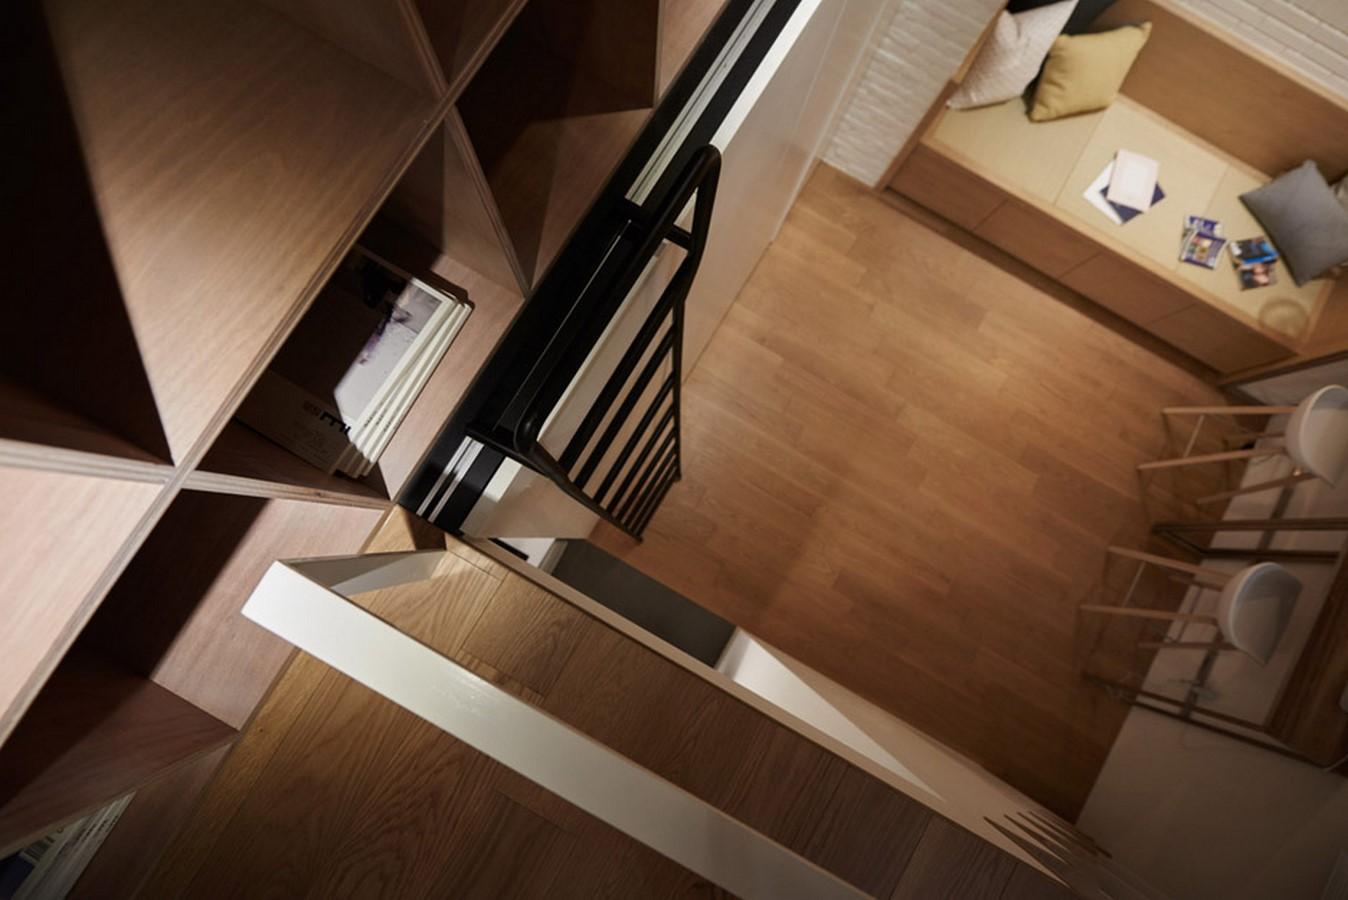 22-meter-square Taiwan apartment- Sheet2